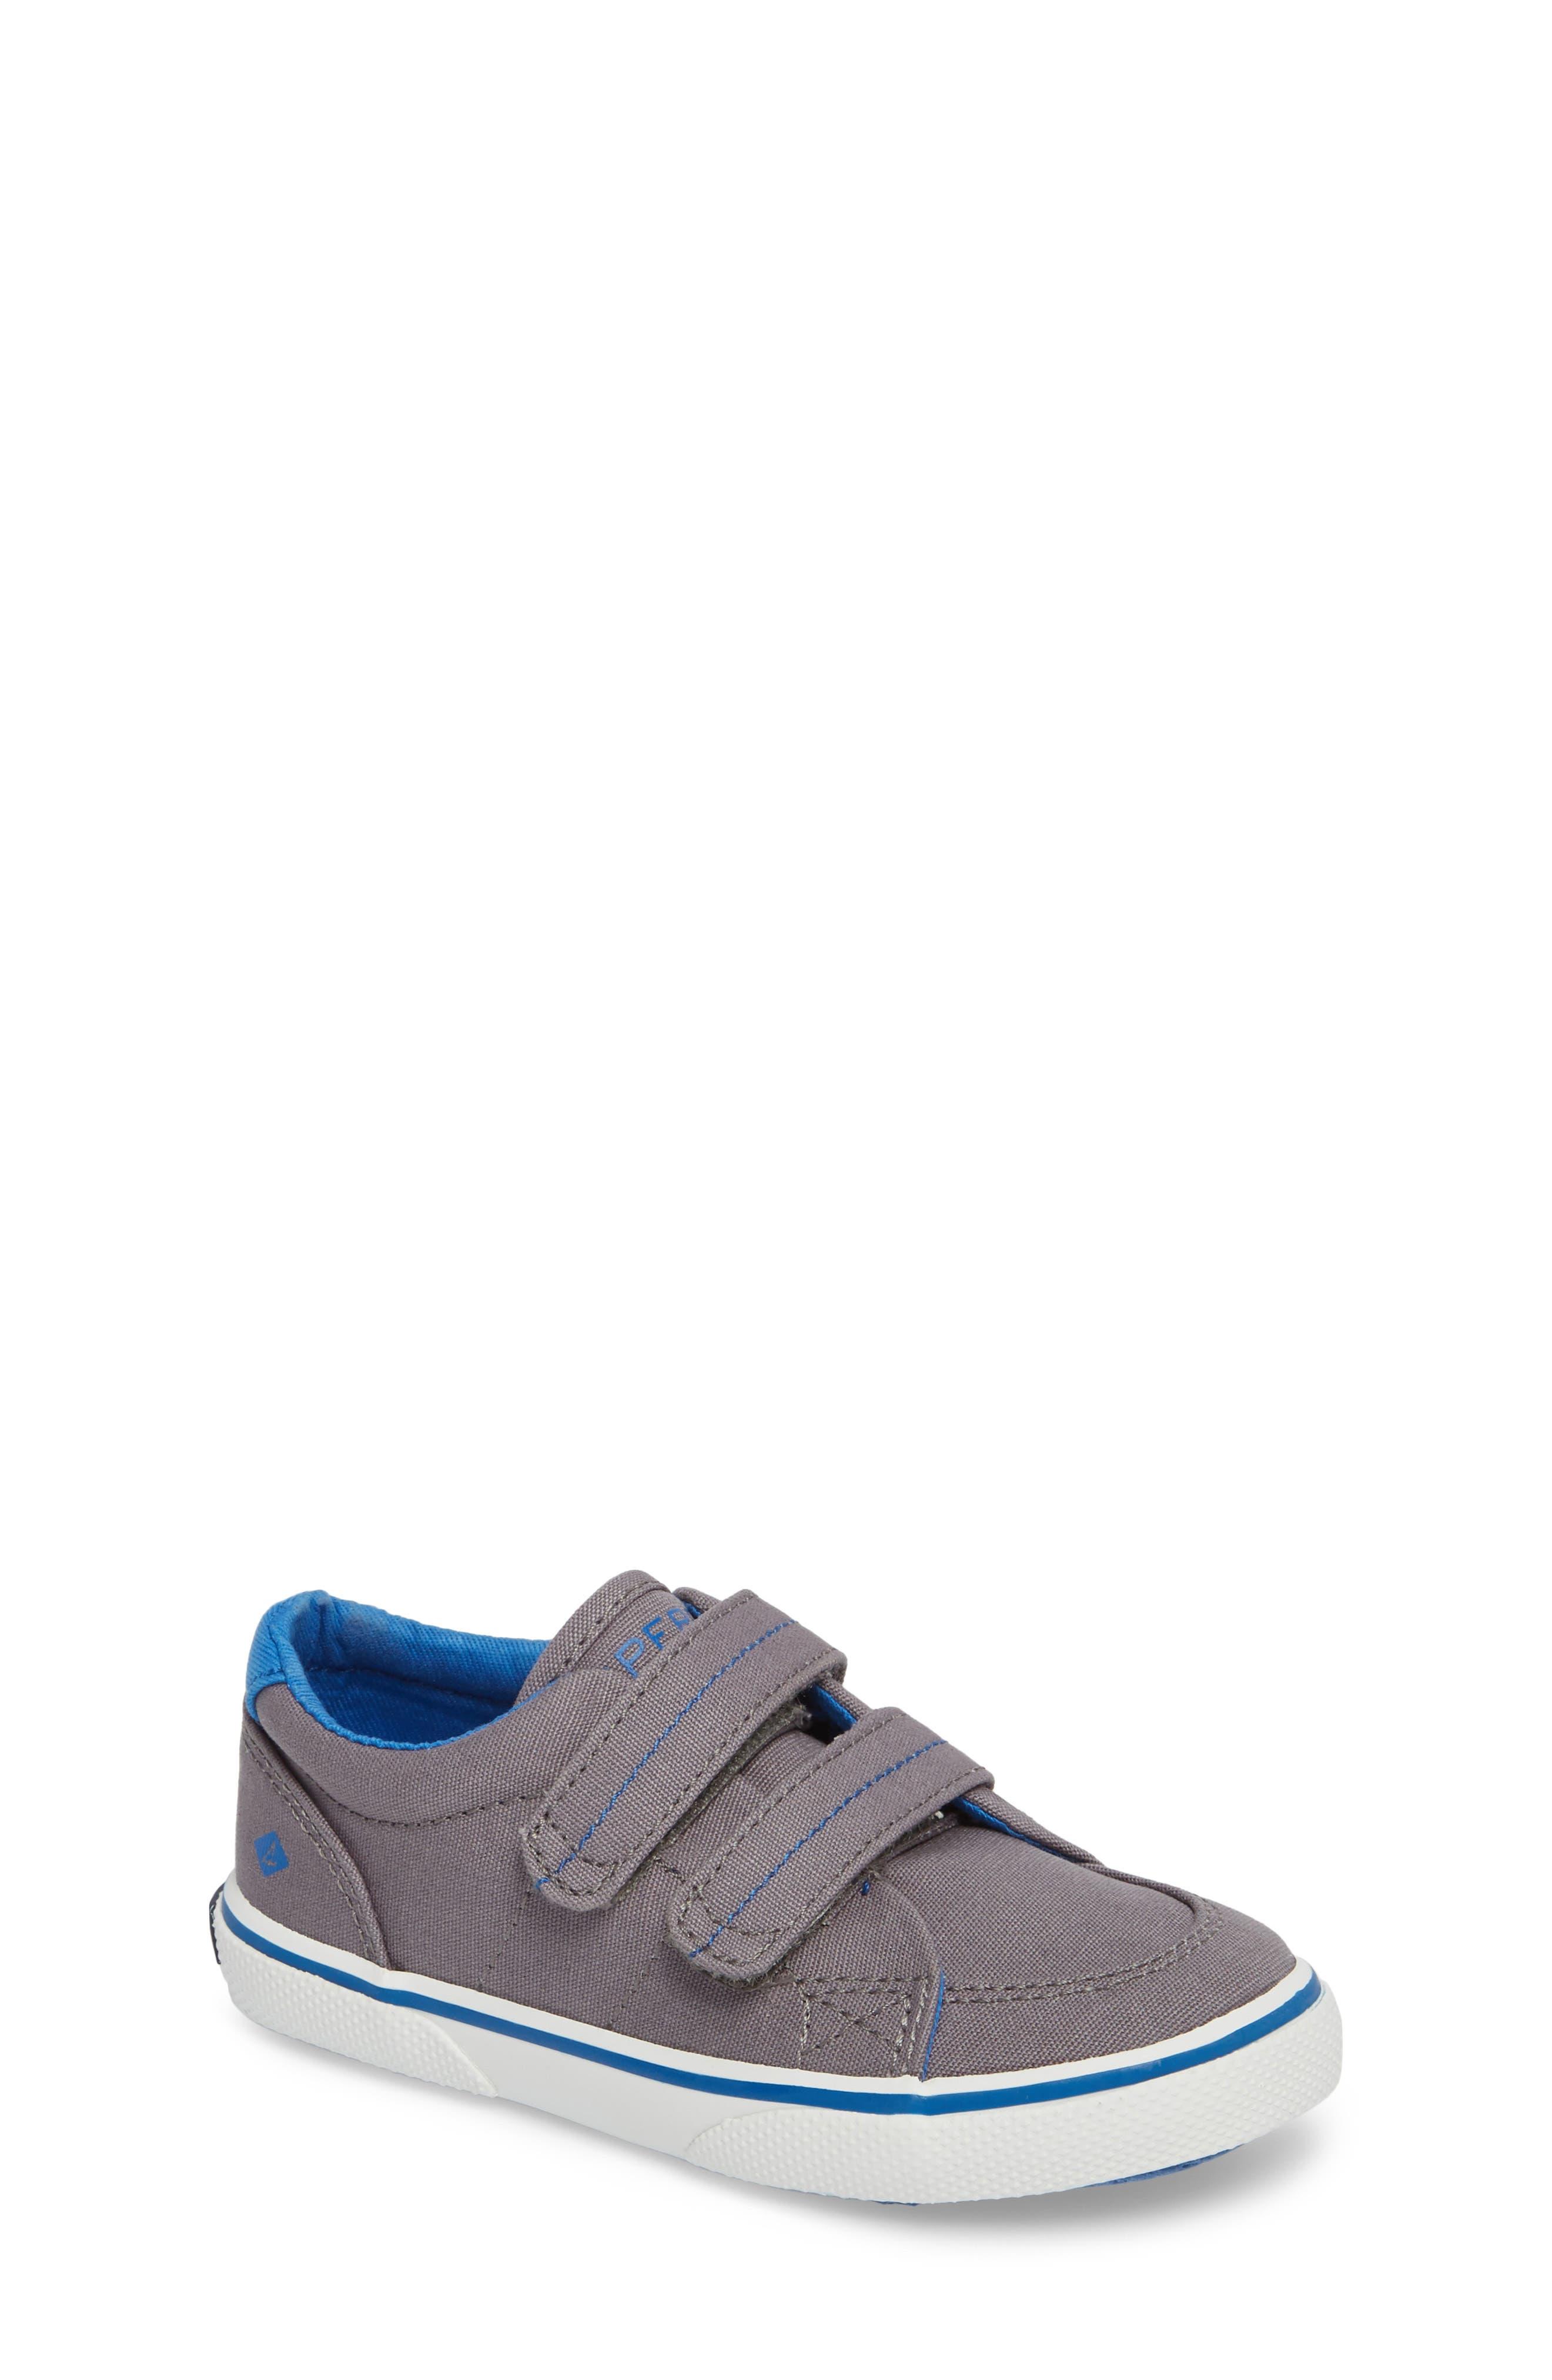 Sperry Top-Sider® Kids 'Halyard' Sneaker (Walker & Toddler)